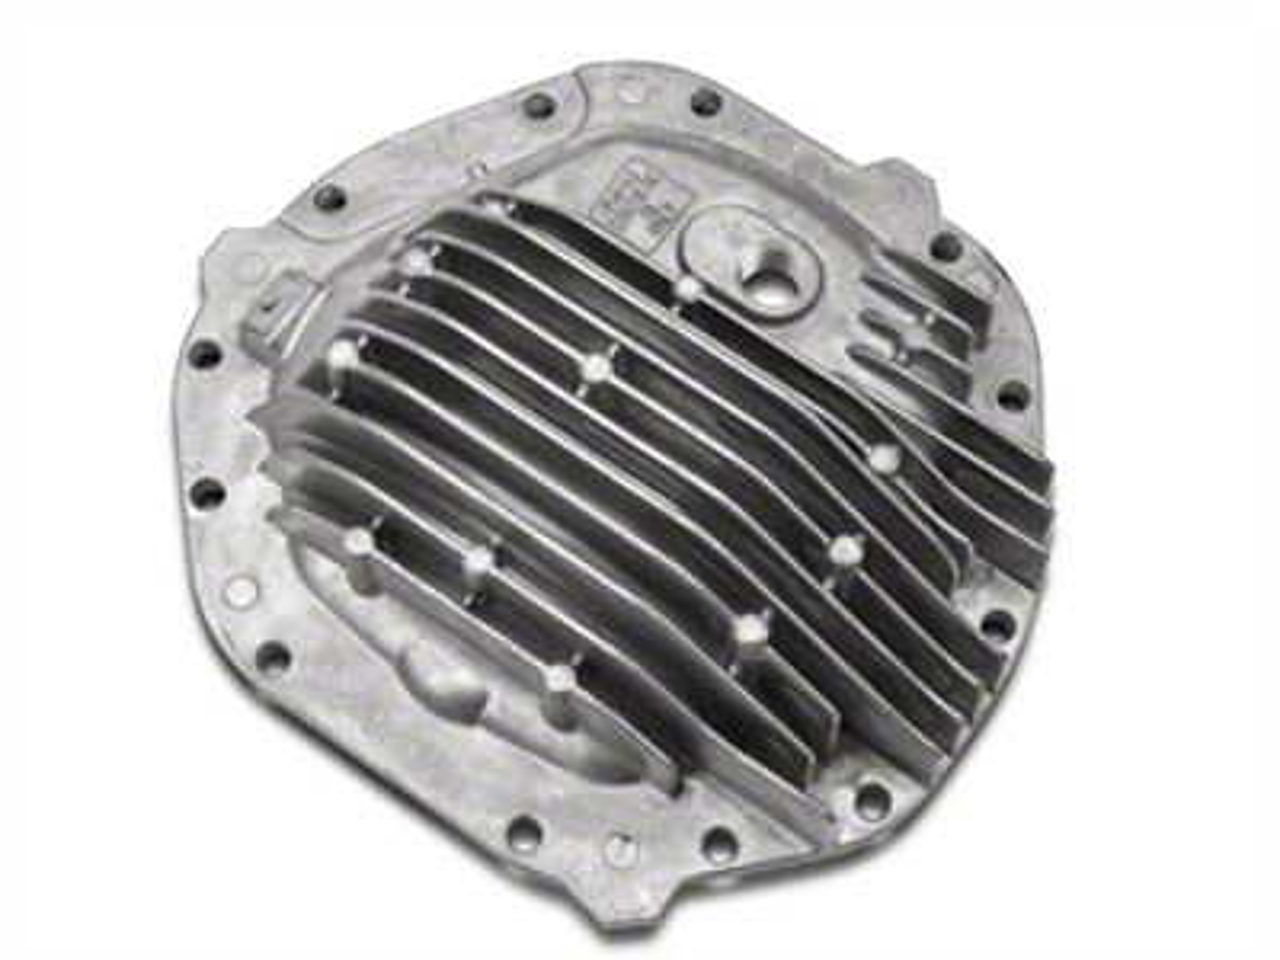 FEL-PRO Differential Cover Gasket Wrangler JK 2007-2016 DANA 44